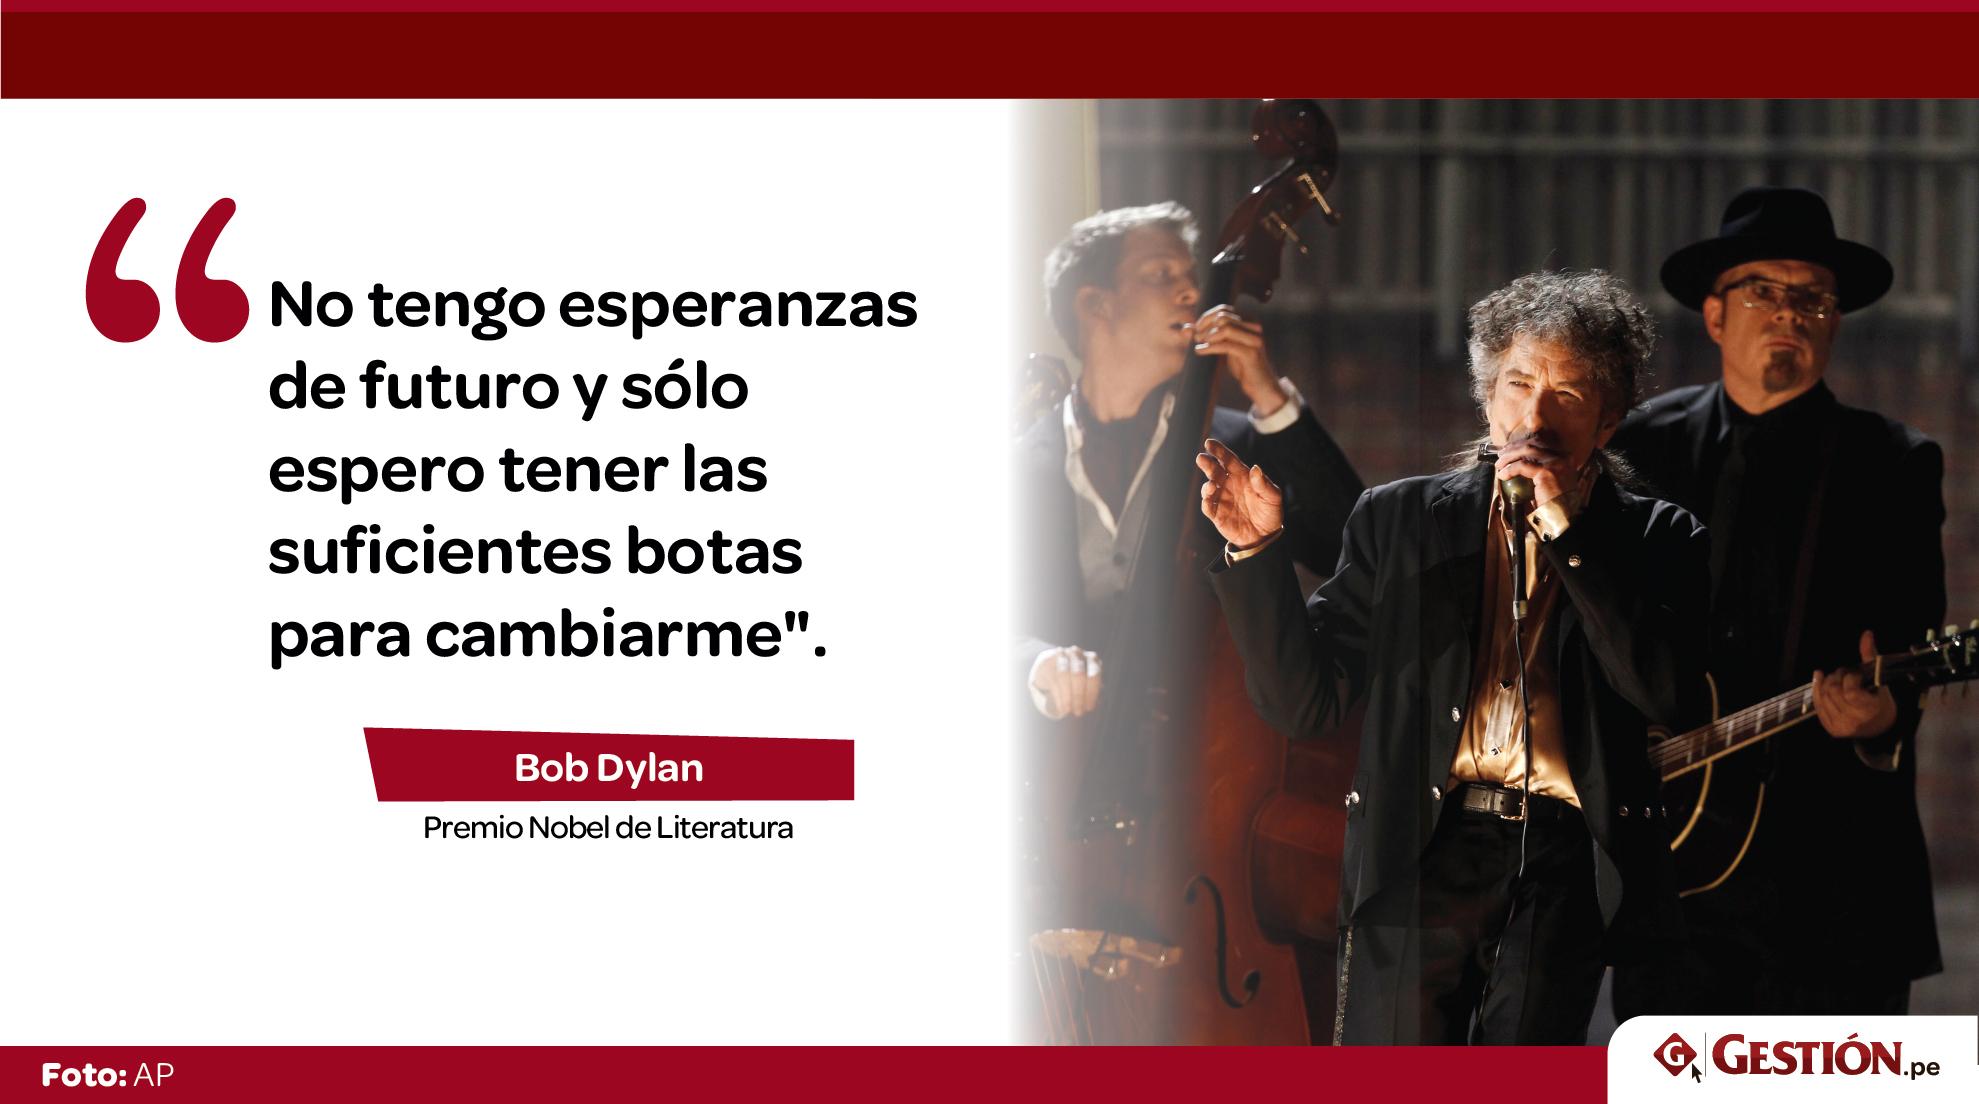 Premio Nobel de Literatura, cantante, Bob Dylan